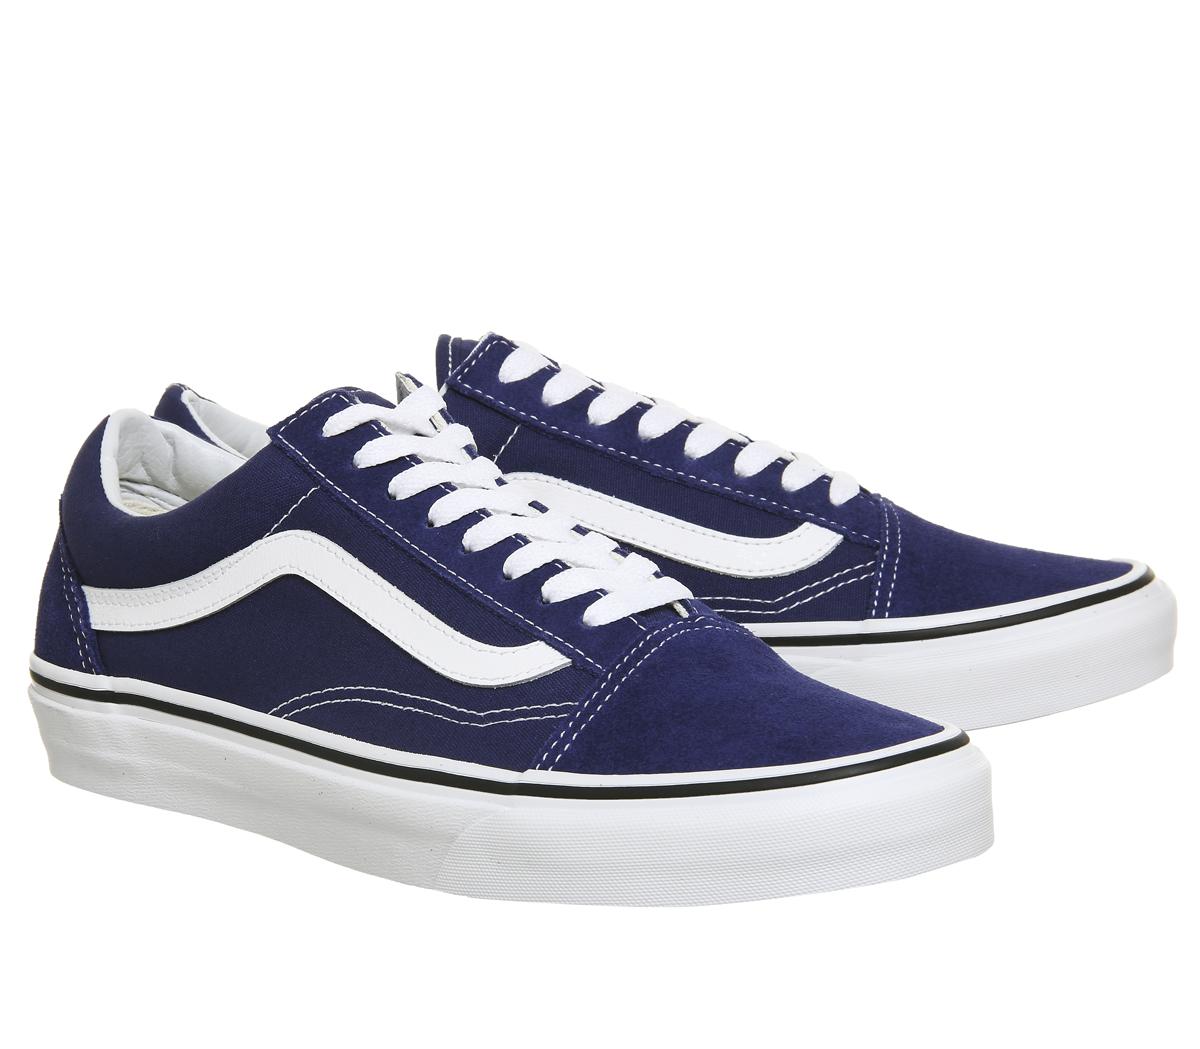 Mens Vans Old Skool Trainers ESTATE Blau TRUE WEISS Trainers Schuhes